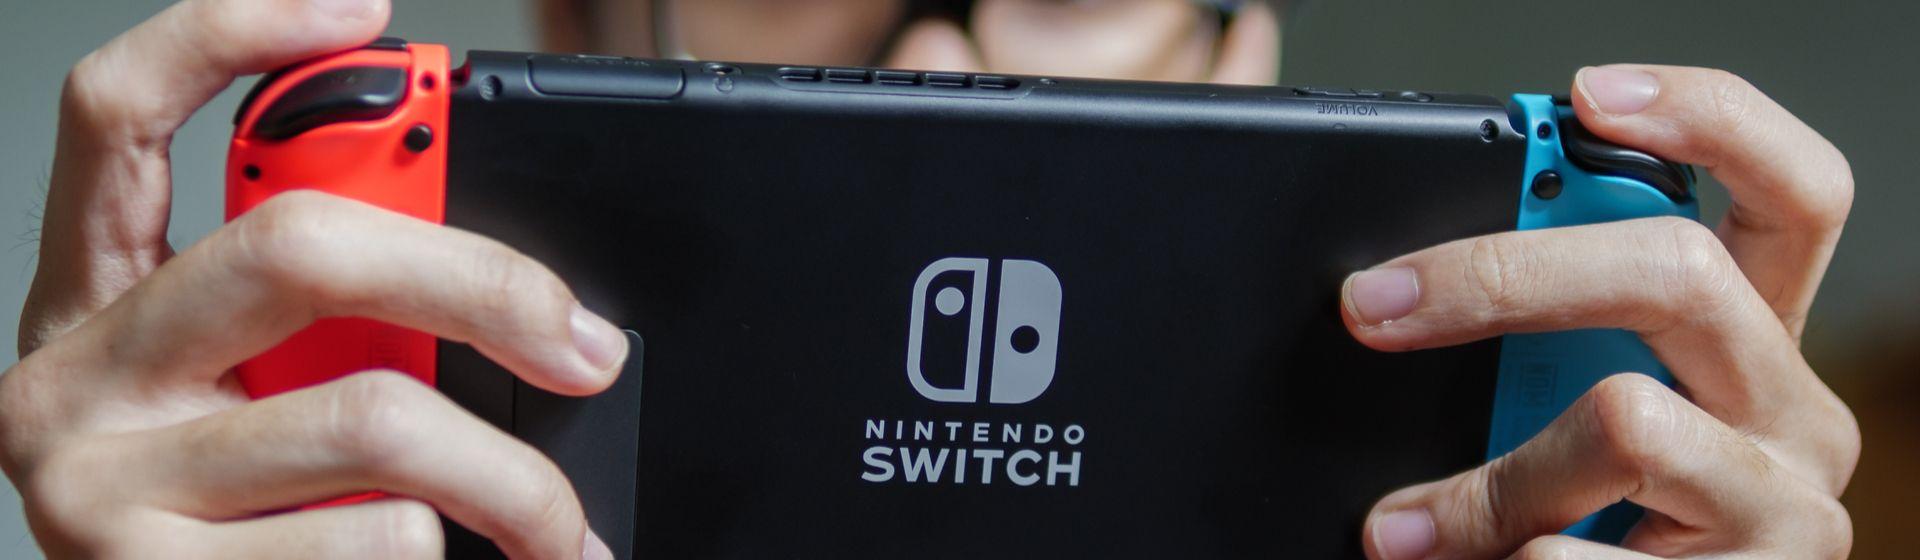 Nintendo Switch usado? Riscos e cuidados na hora de comprar barato